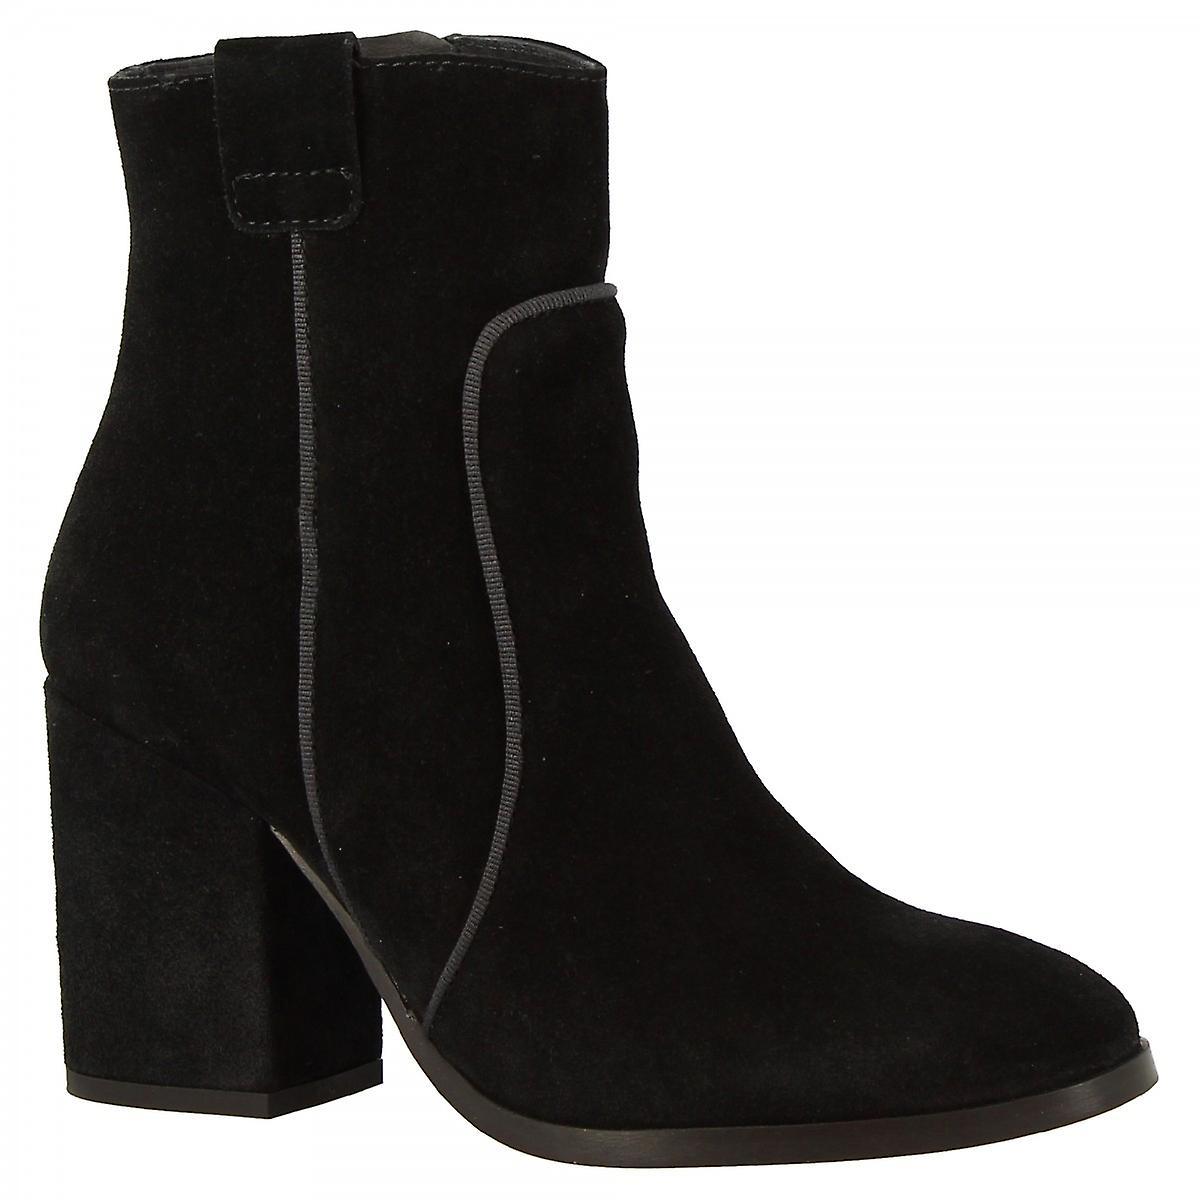 Leonardo Shoes Women's handmade heels ankle boots black suede leather side zip 9X6i8